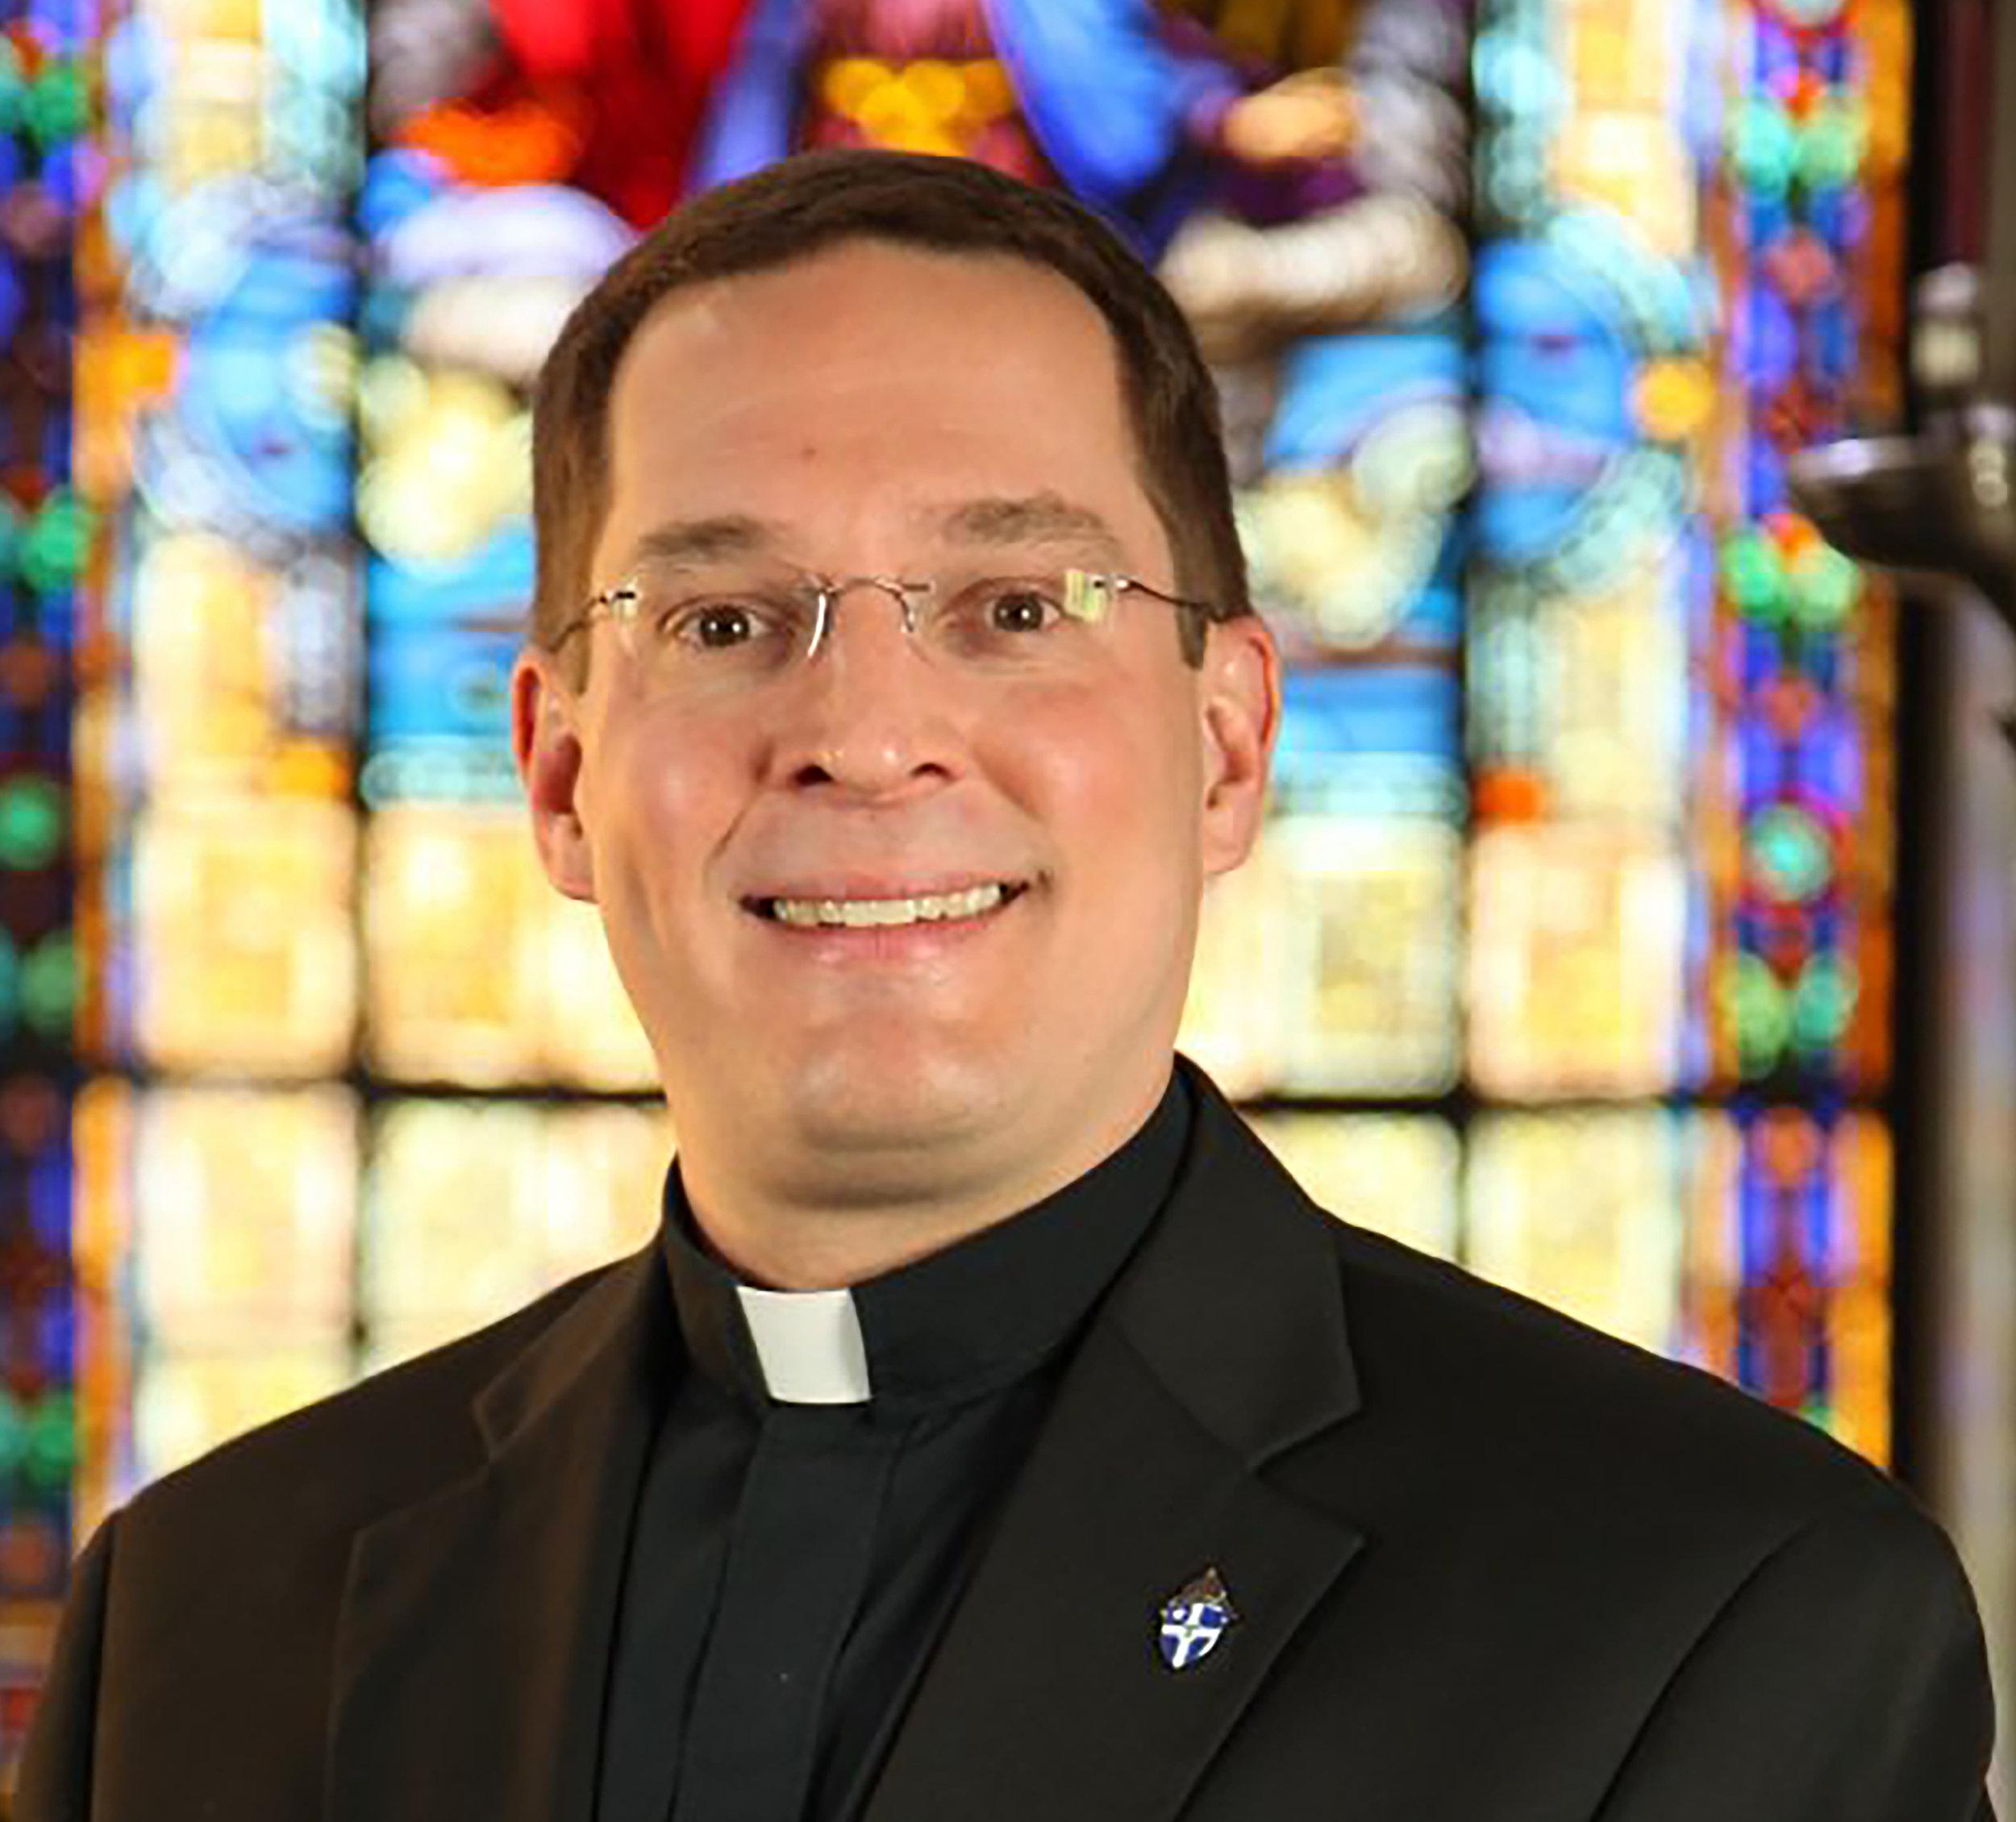 Fr. Jason Martini - Administratorjason.martini@archsa.org